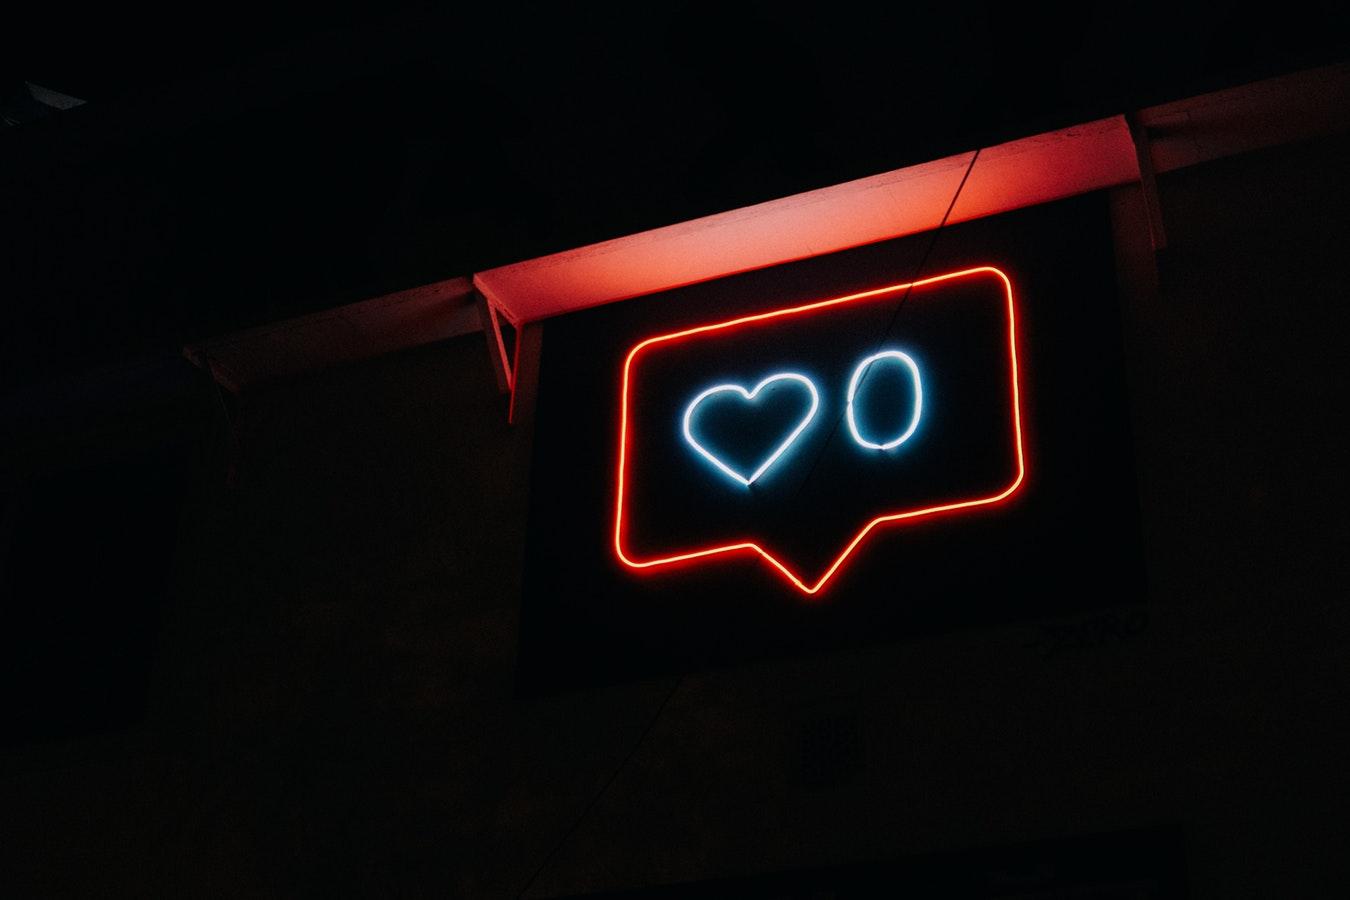 Neon post showing social media likes as zero